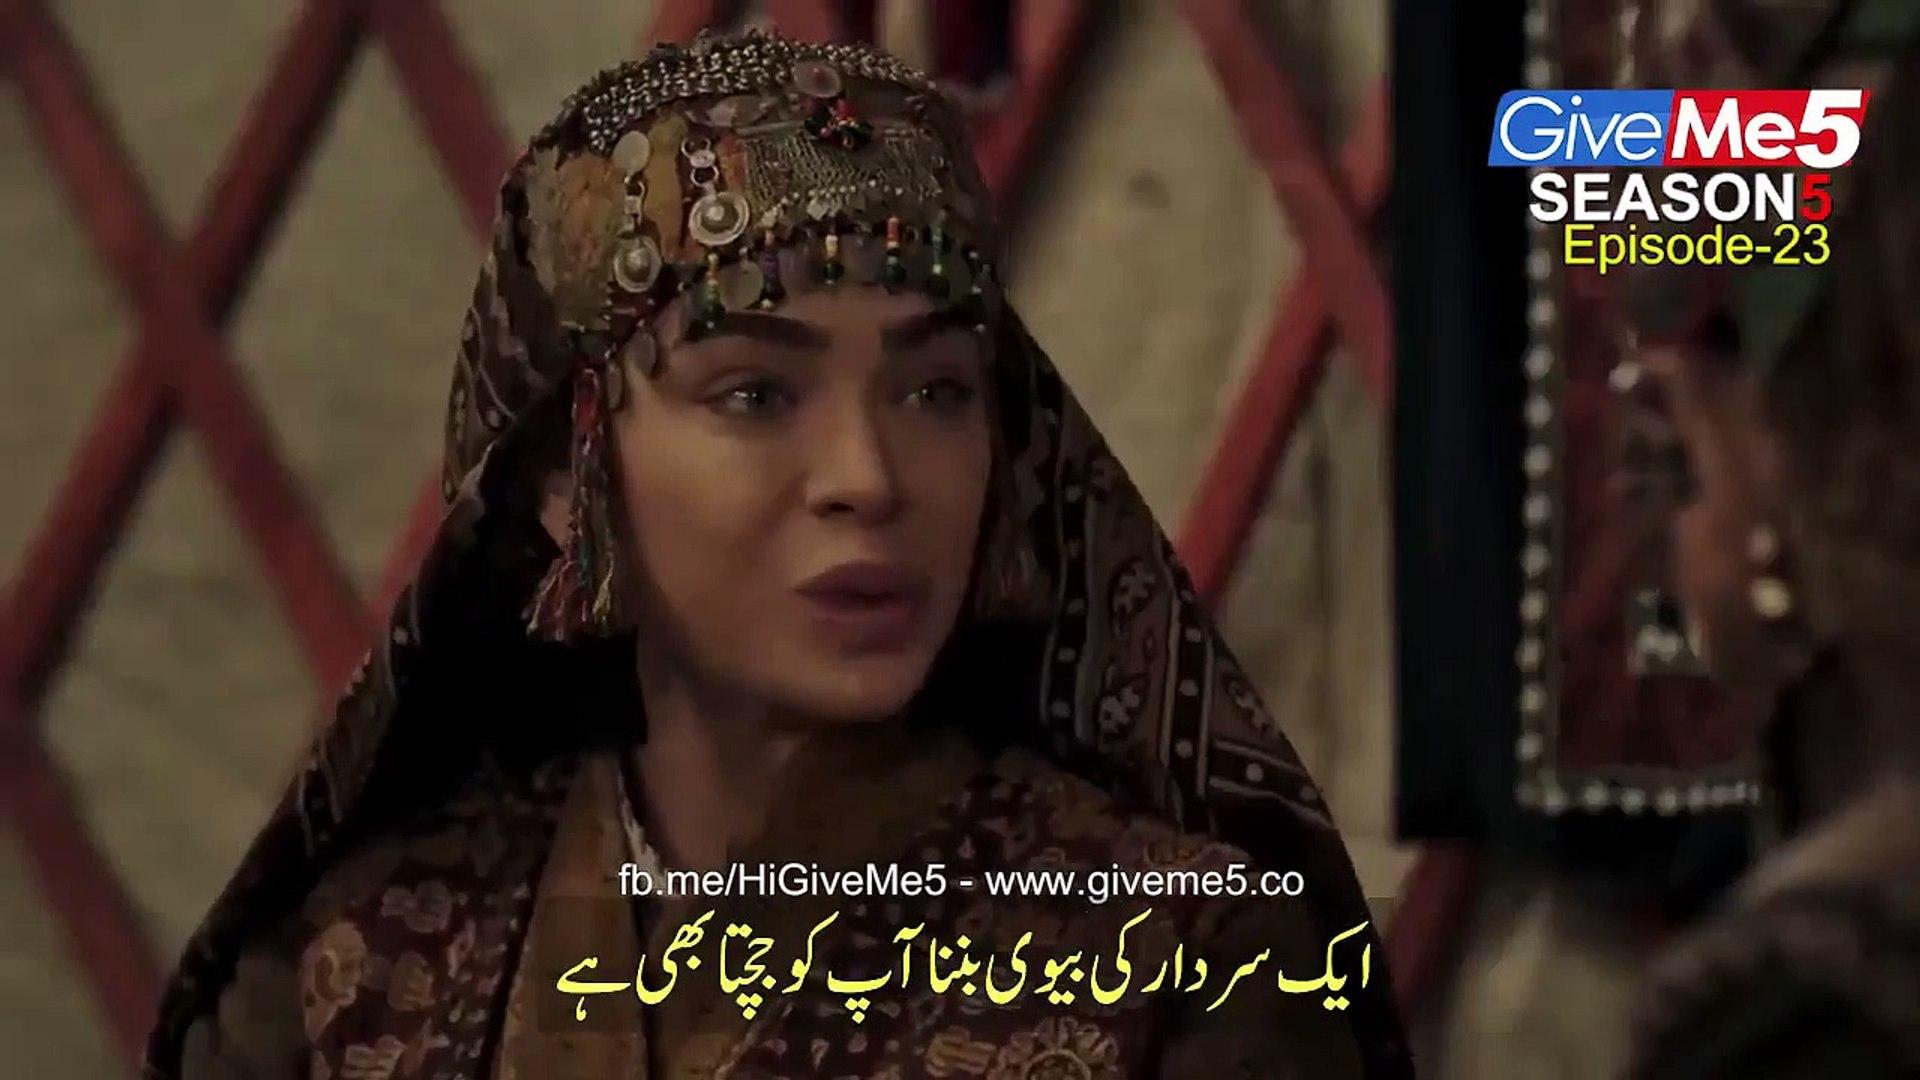 Dirilis Ertugrul Ghazi Season 5 in Urdu Subtitle Episode 23 & 24